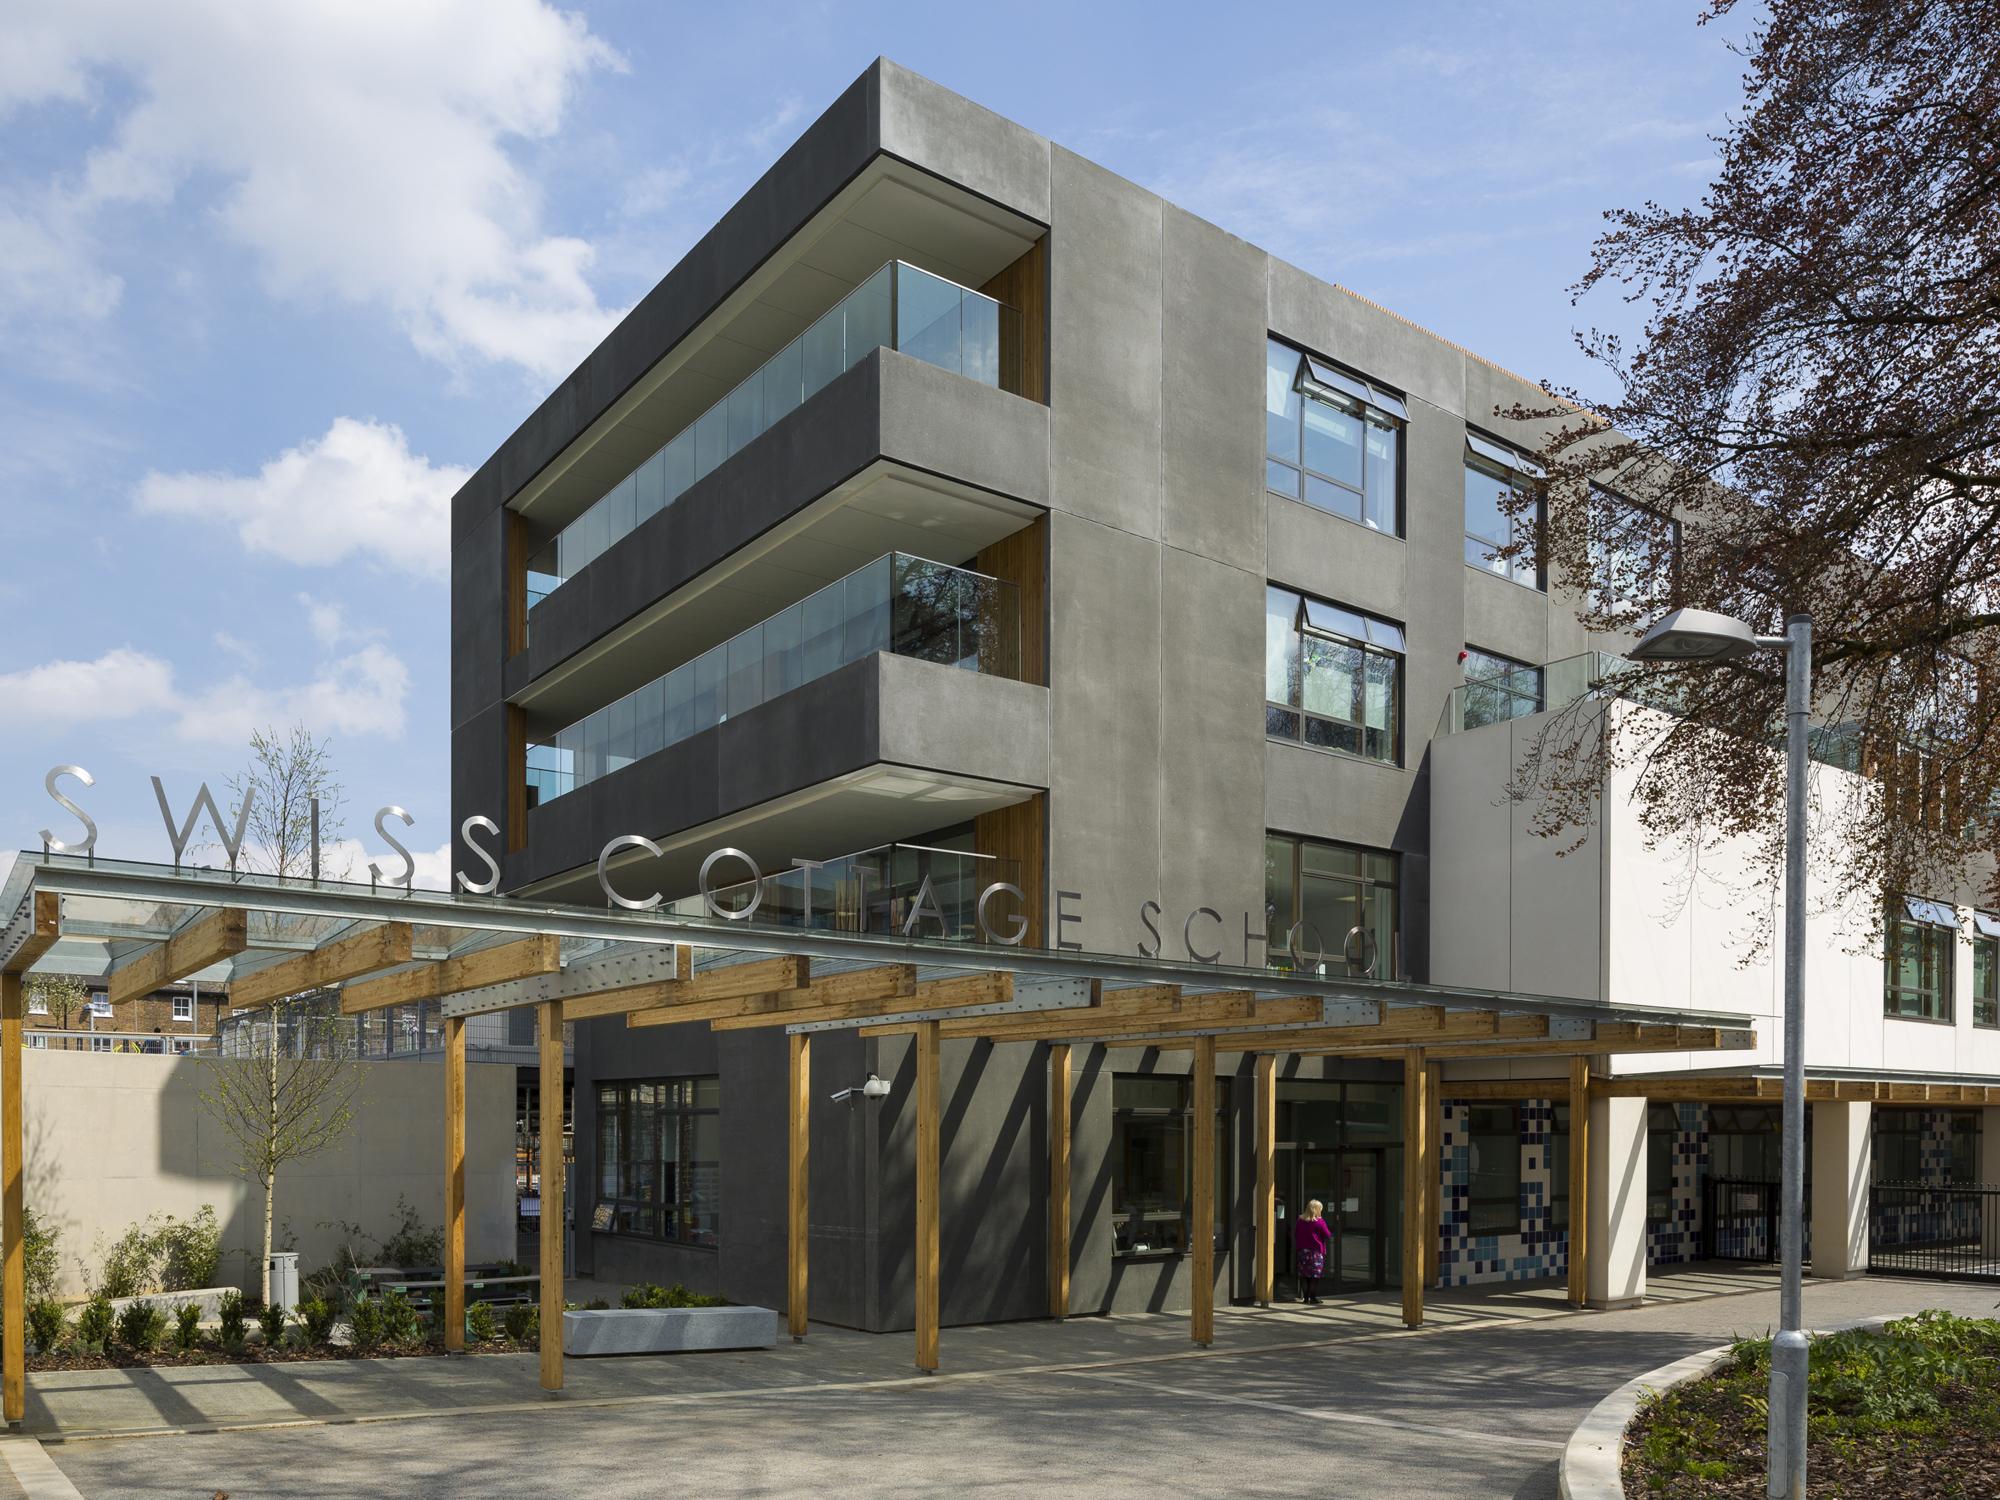 Swiss Cottage Specialist SEN School | Penoyre U0026 Prasad Architects, London